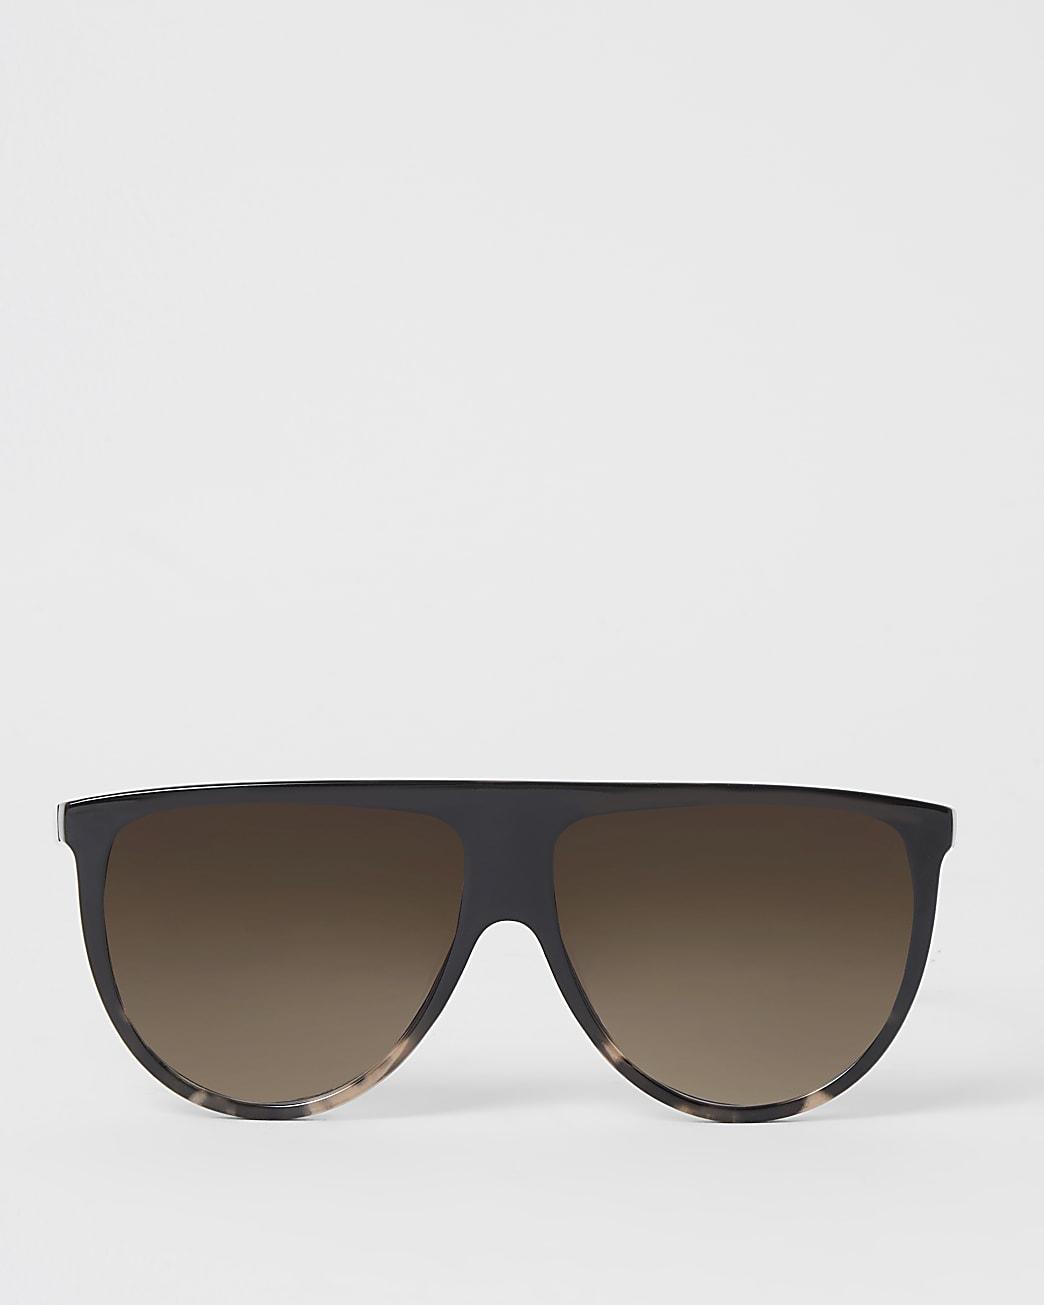 Dark brown visor sunglasses